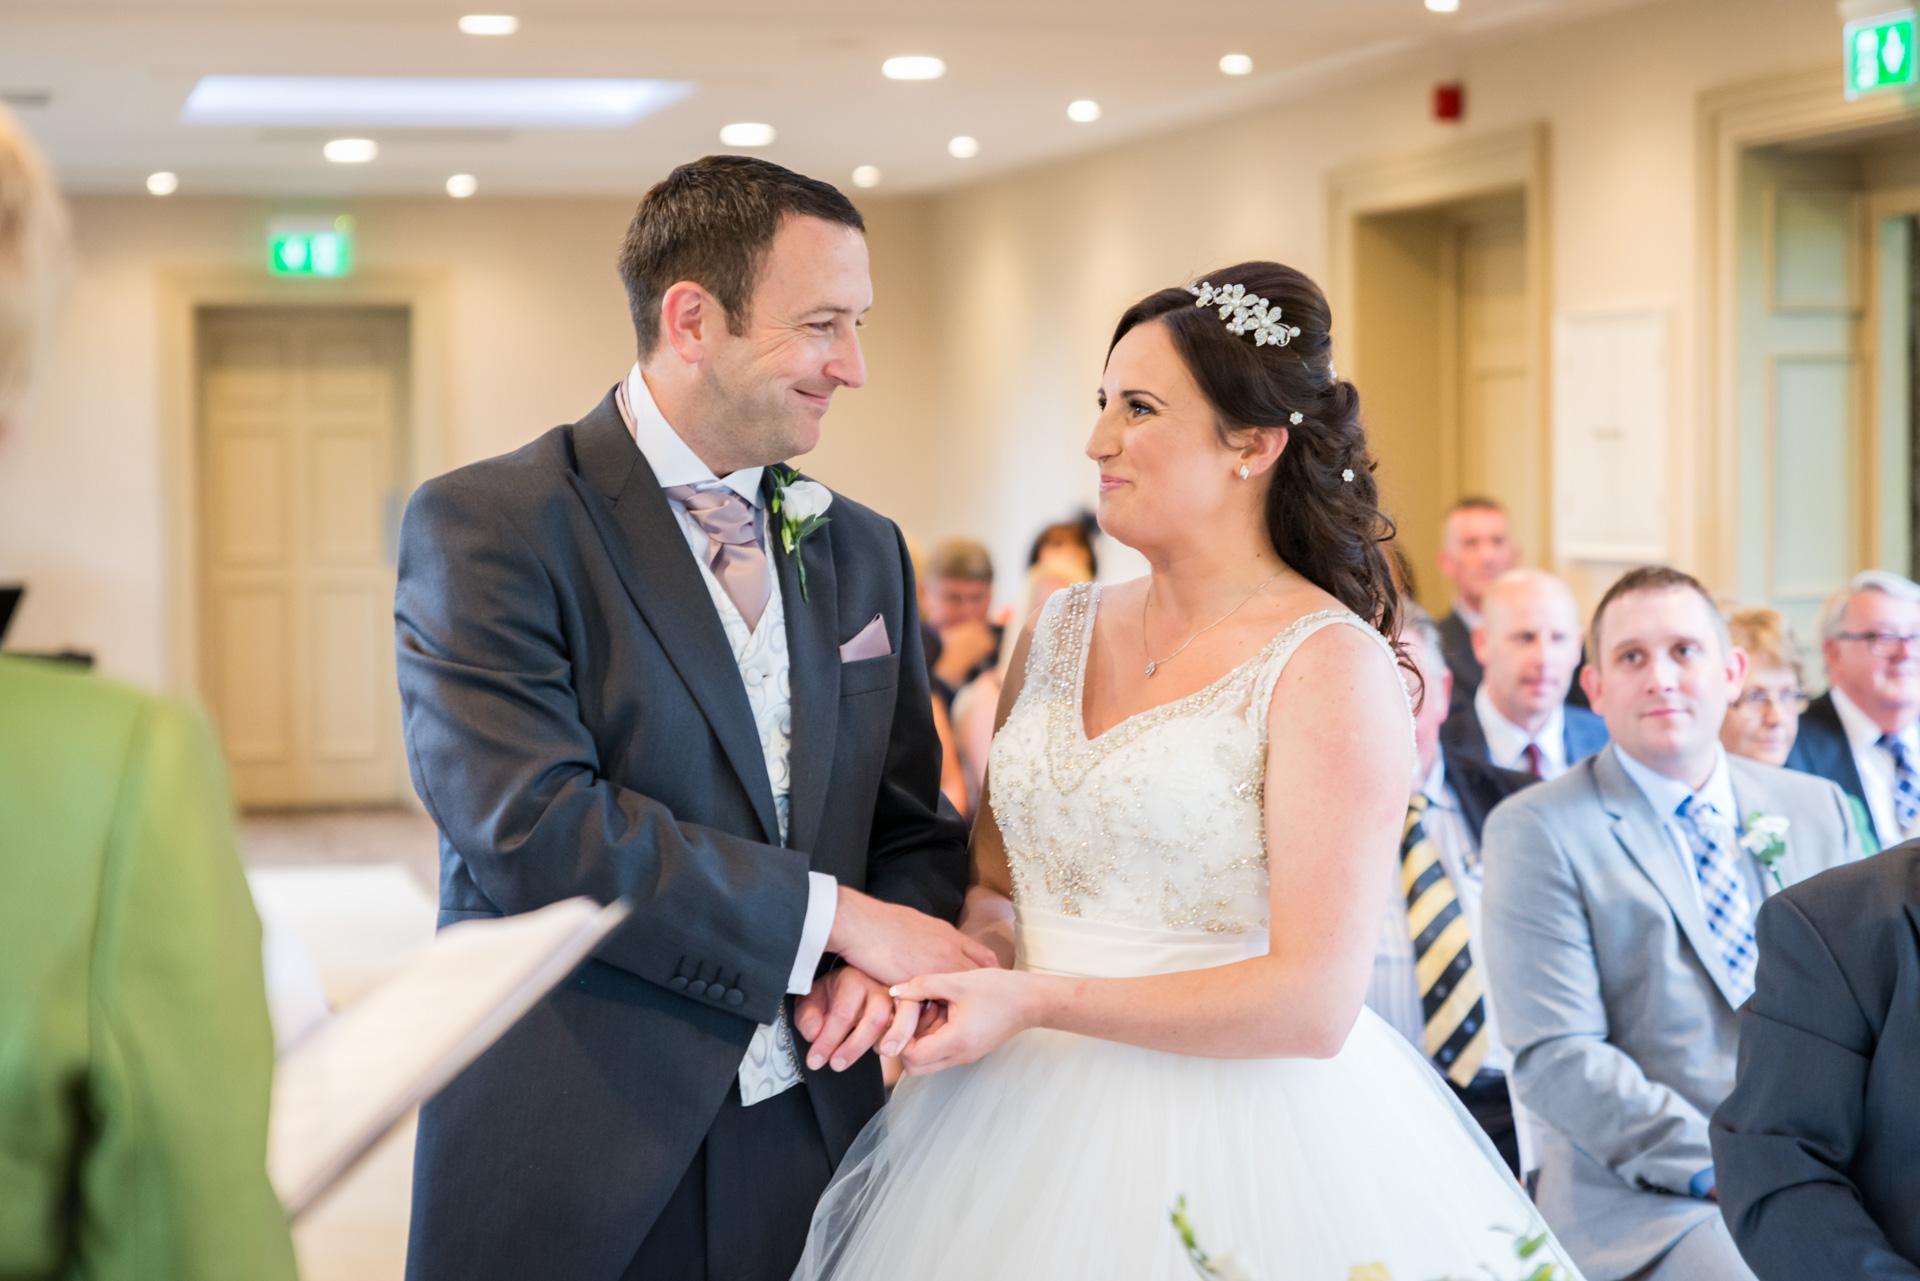 Crabwall Manor Wedding Photography